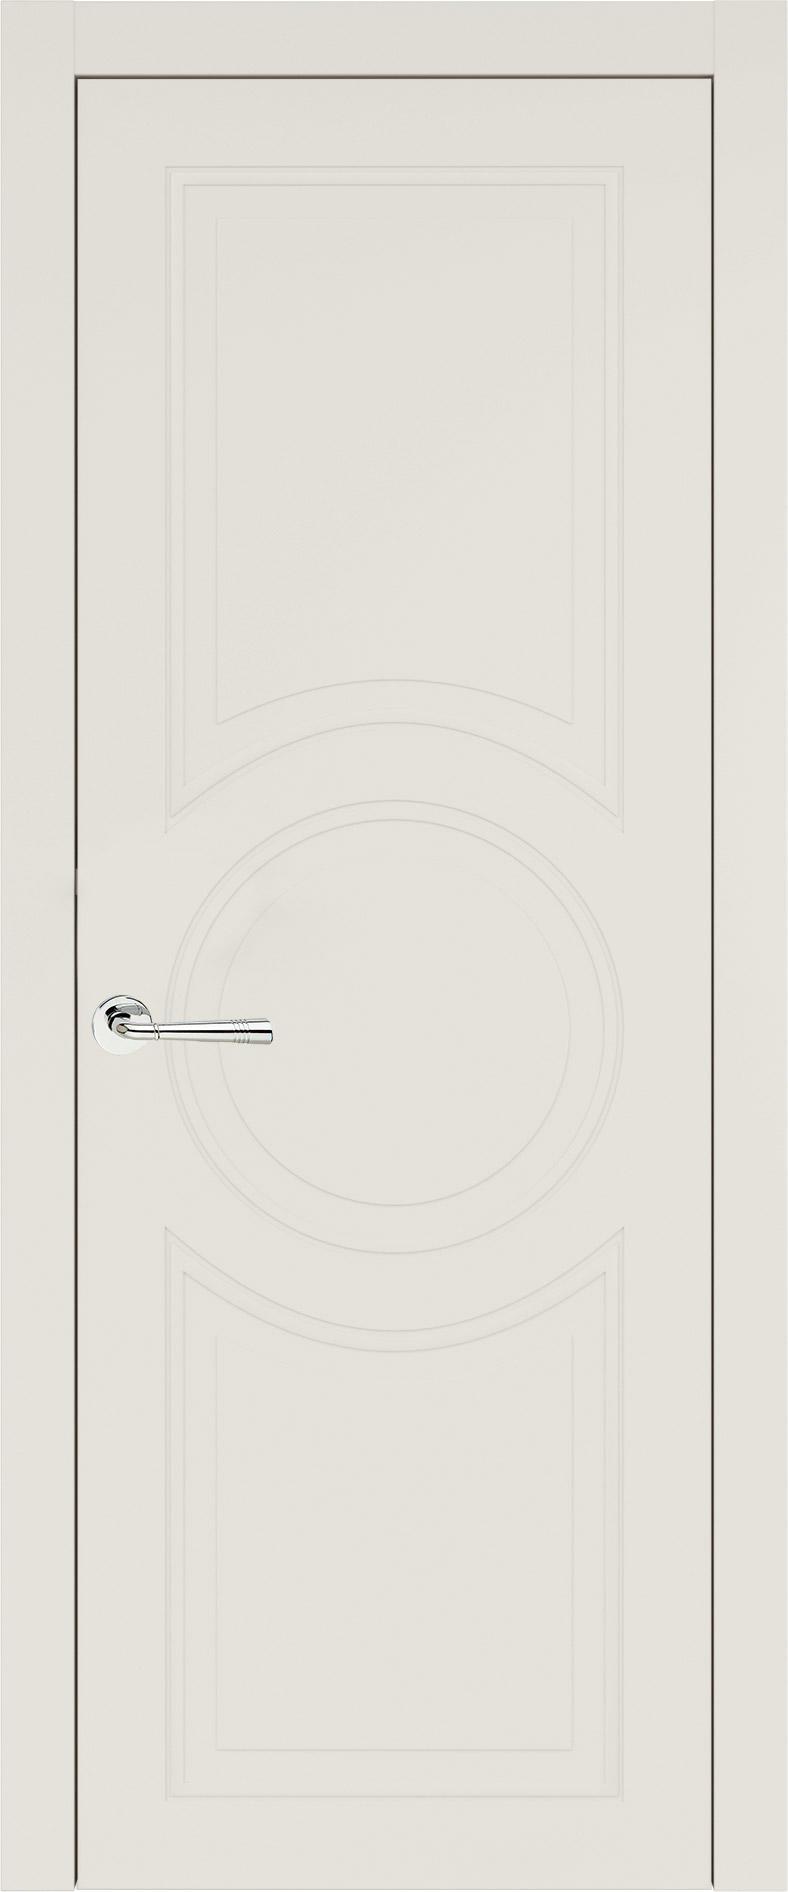 Ravenna Neo Classic цвет - Бежевая эмаль (RAL 9010) Без стекла (ДГ)